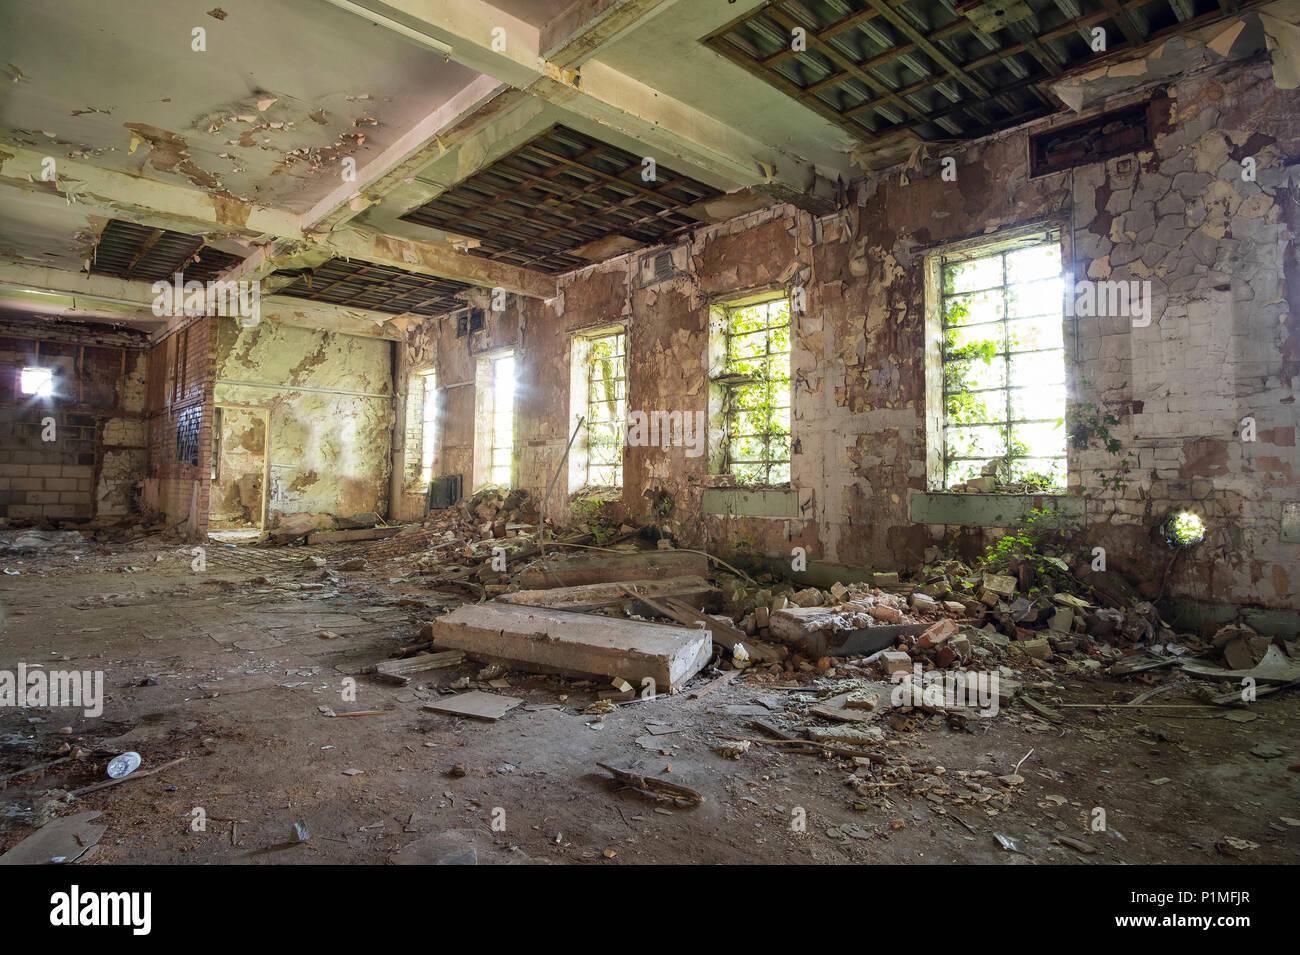 Abandoned buildings at Stanton Ironworks, Derbyshire, UK - Stock Image